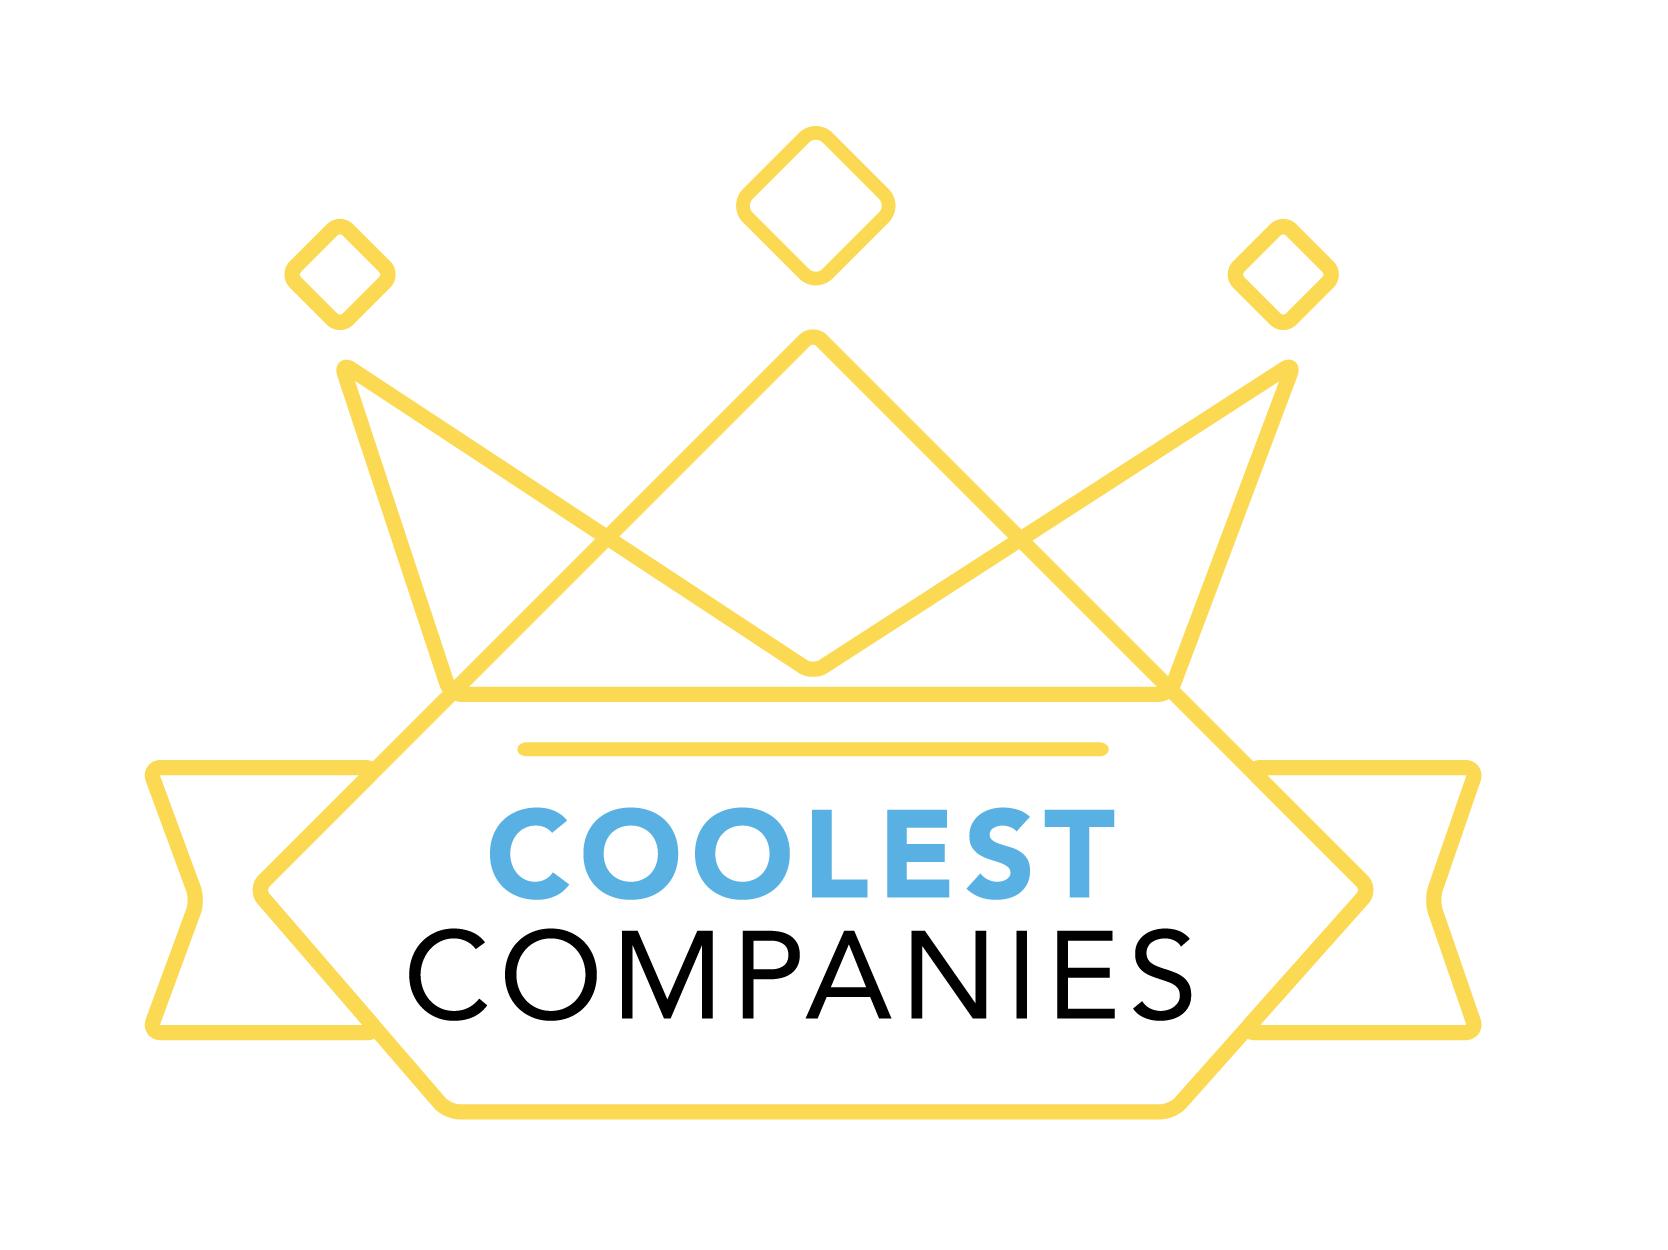 coolest companies logo.png